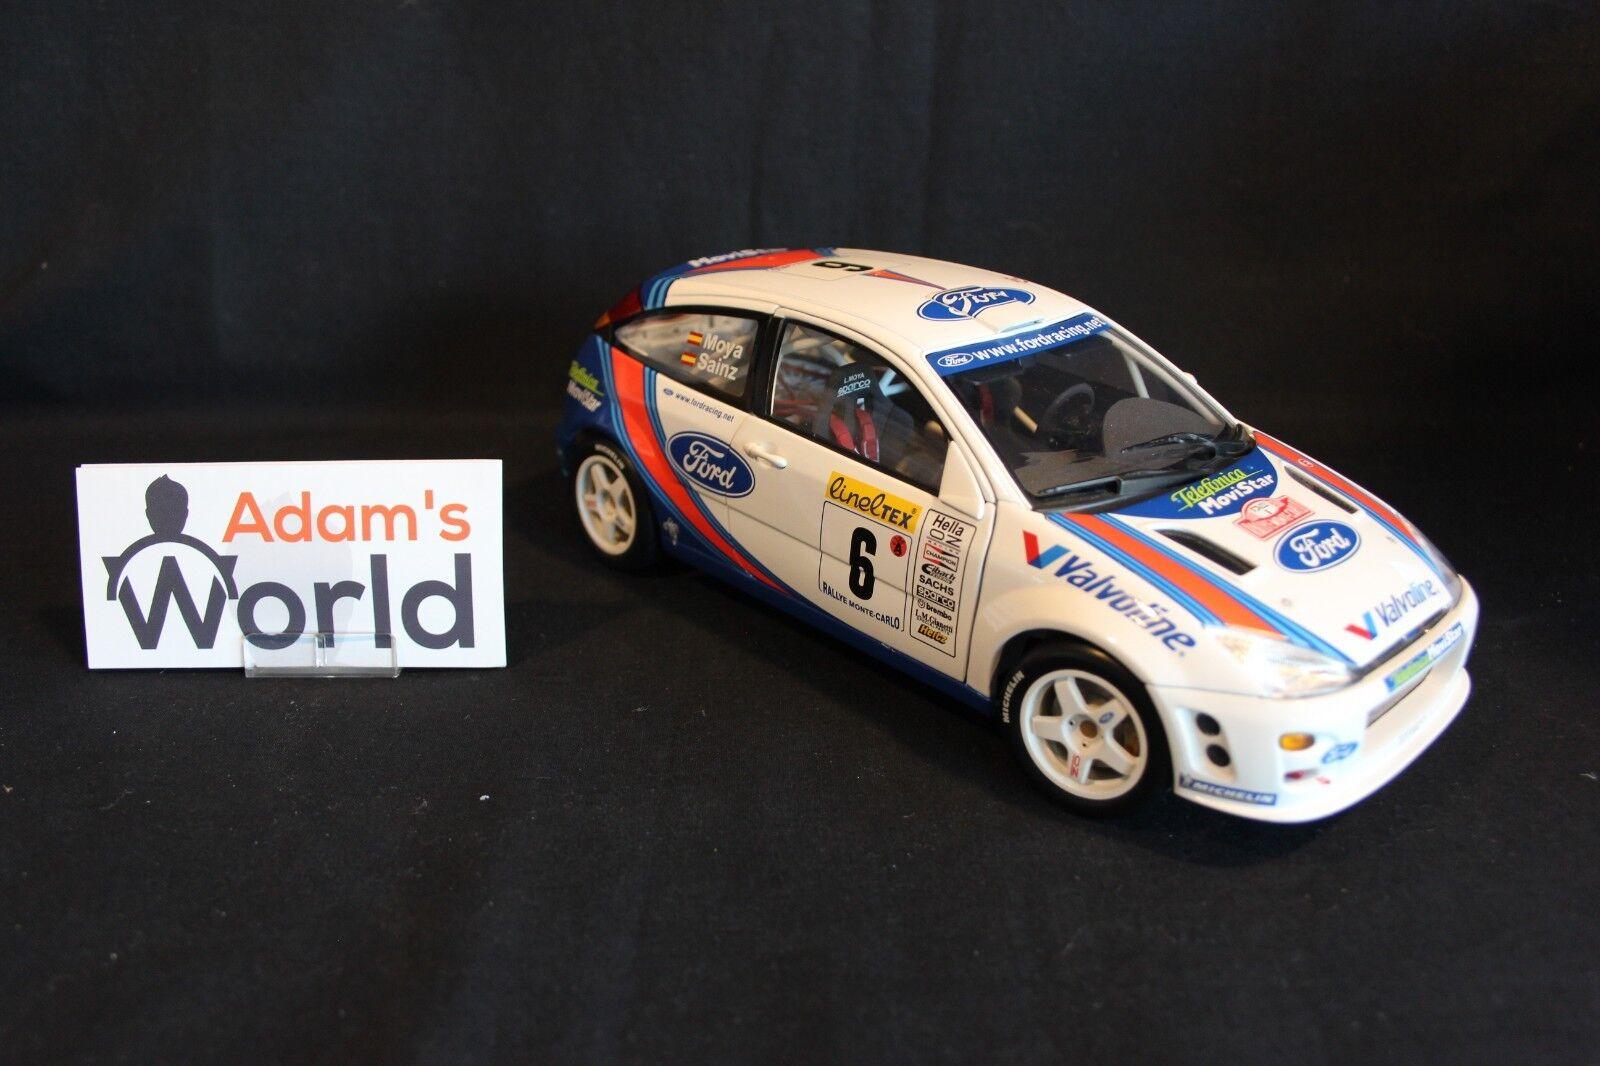 AutoArt Ford Focus RS WRC 2000 1 18  6 Sainz   Moya Rally Monte Carlo (JvdM)